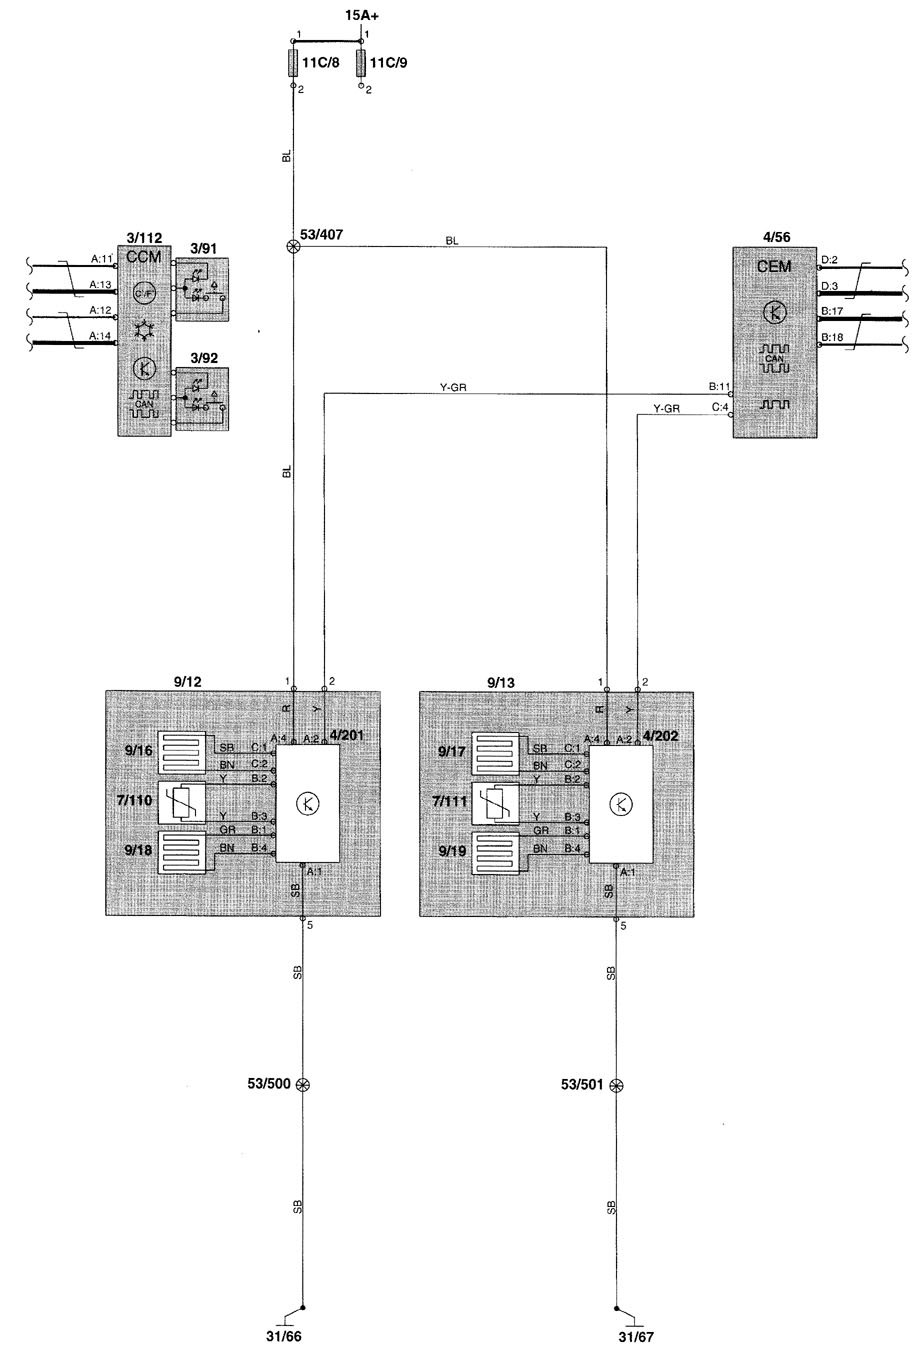 Volvo V70 (2000 - 2002) - wiring diagrams - heated seats ... on porsche cayenne wiring diagram, volvo amazon wiring diagram, chevrolet hhr wiring diagram, volkswagen golf wiring diagram, volvo 850 water pump, dodge omni wiring diagram, honda ascot wiring diagram, volvo 850 shop manual, geo storm wiring diagram, volkswagen cabrio wiring diagram, chevrolet volt wiring diagram, pontiac trans sport wiring diagram, saturn aura wiring diagram, chrysler crossfire wiring diagram, mercedes e320 wiring diagram, volvo 850 suspension, bmw e90 wiring diagram, mitsubishi starion wiring diagram, volvo ignition wiring diagram, mercury milan wiring diagram,